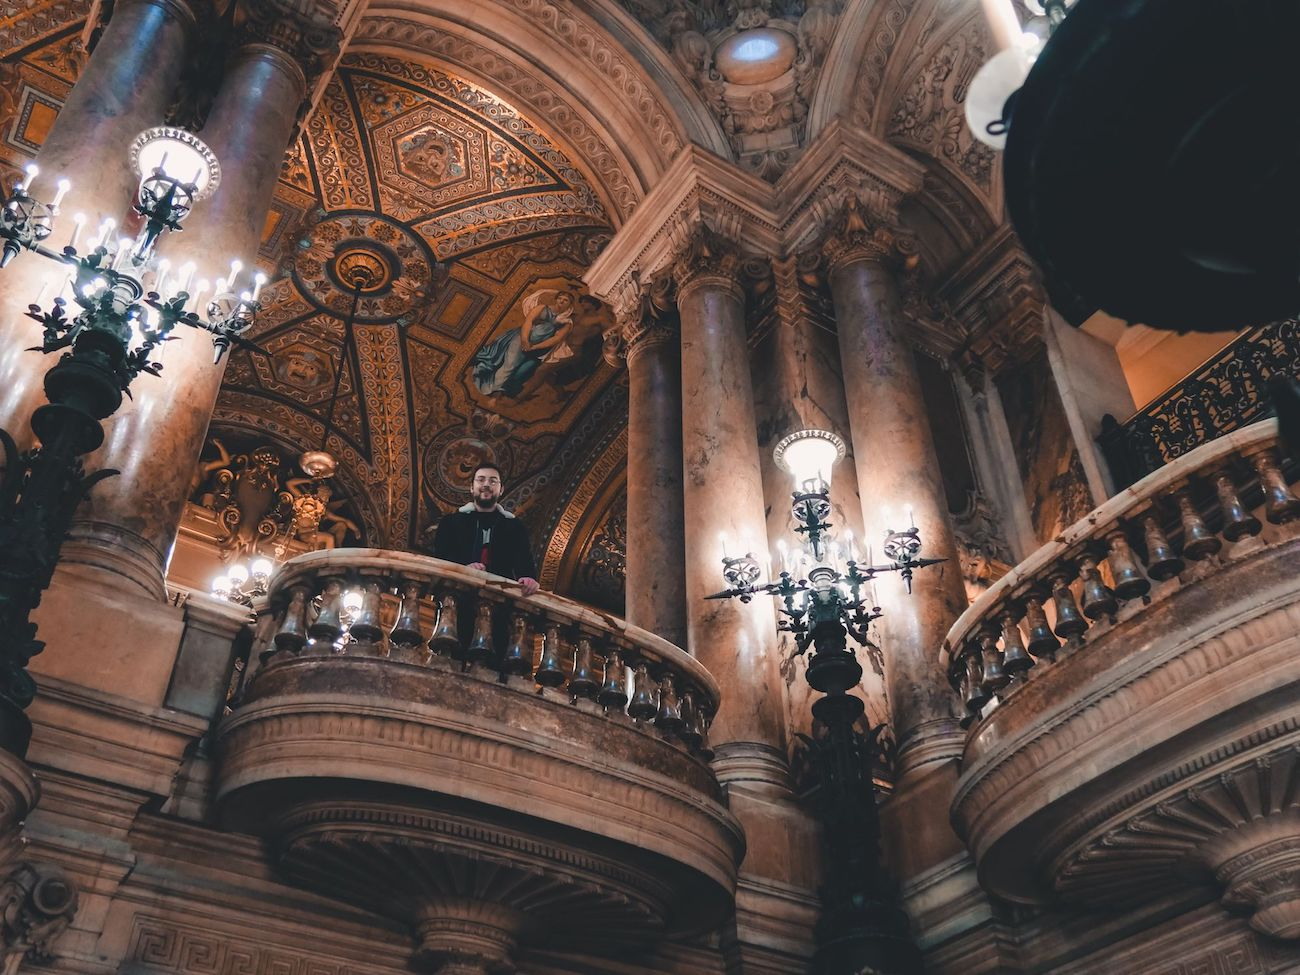 Visiter l'Opéra Garnier